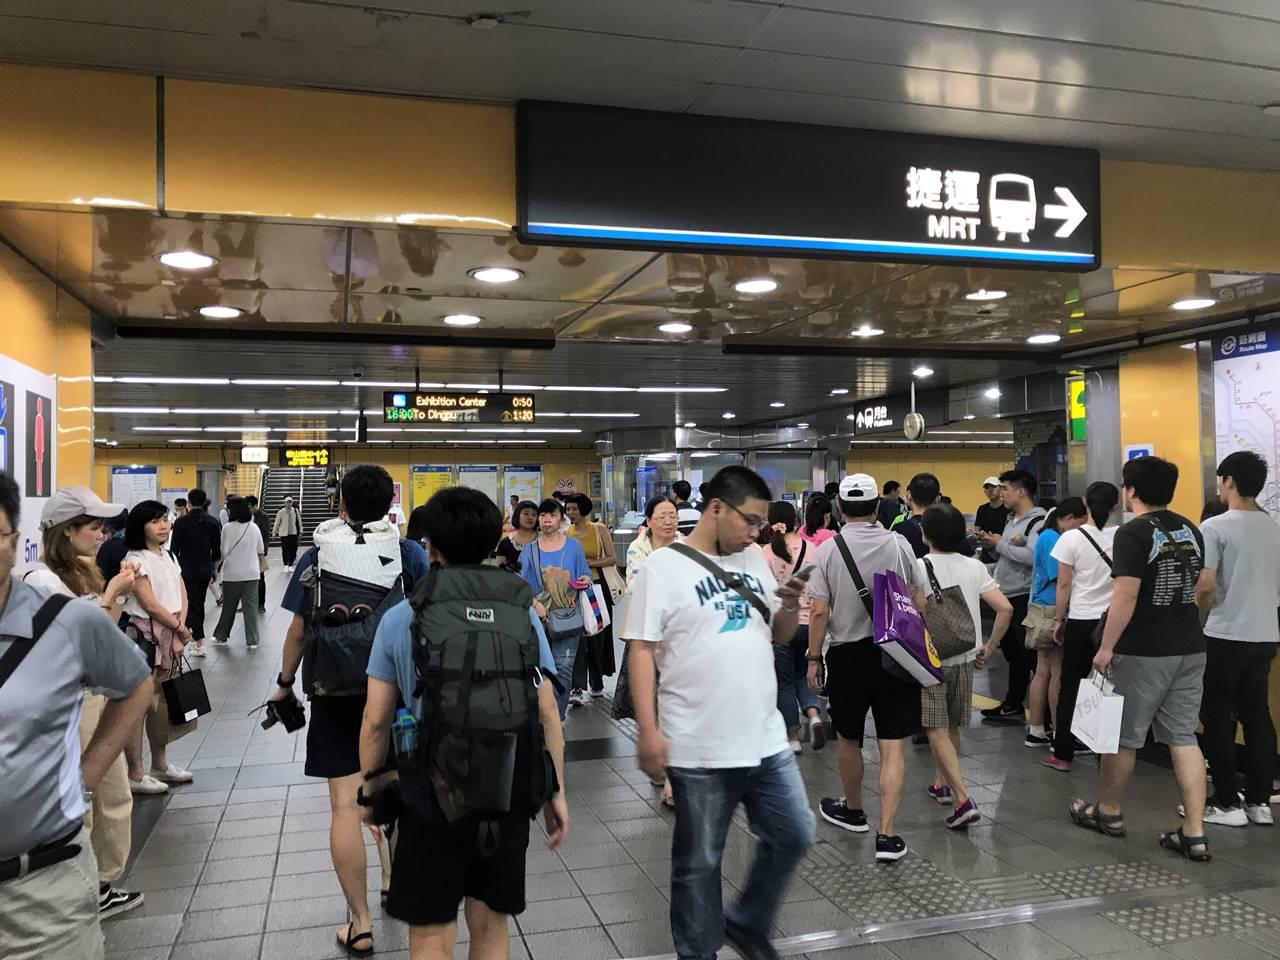 台湾の地下鉄(MRT)